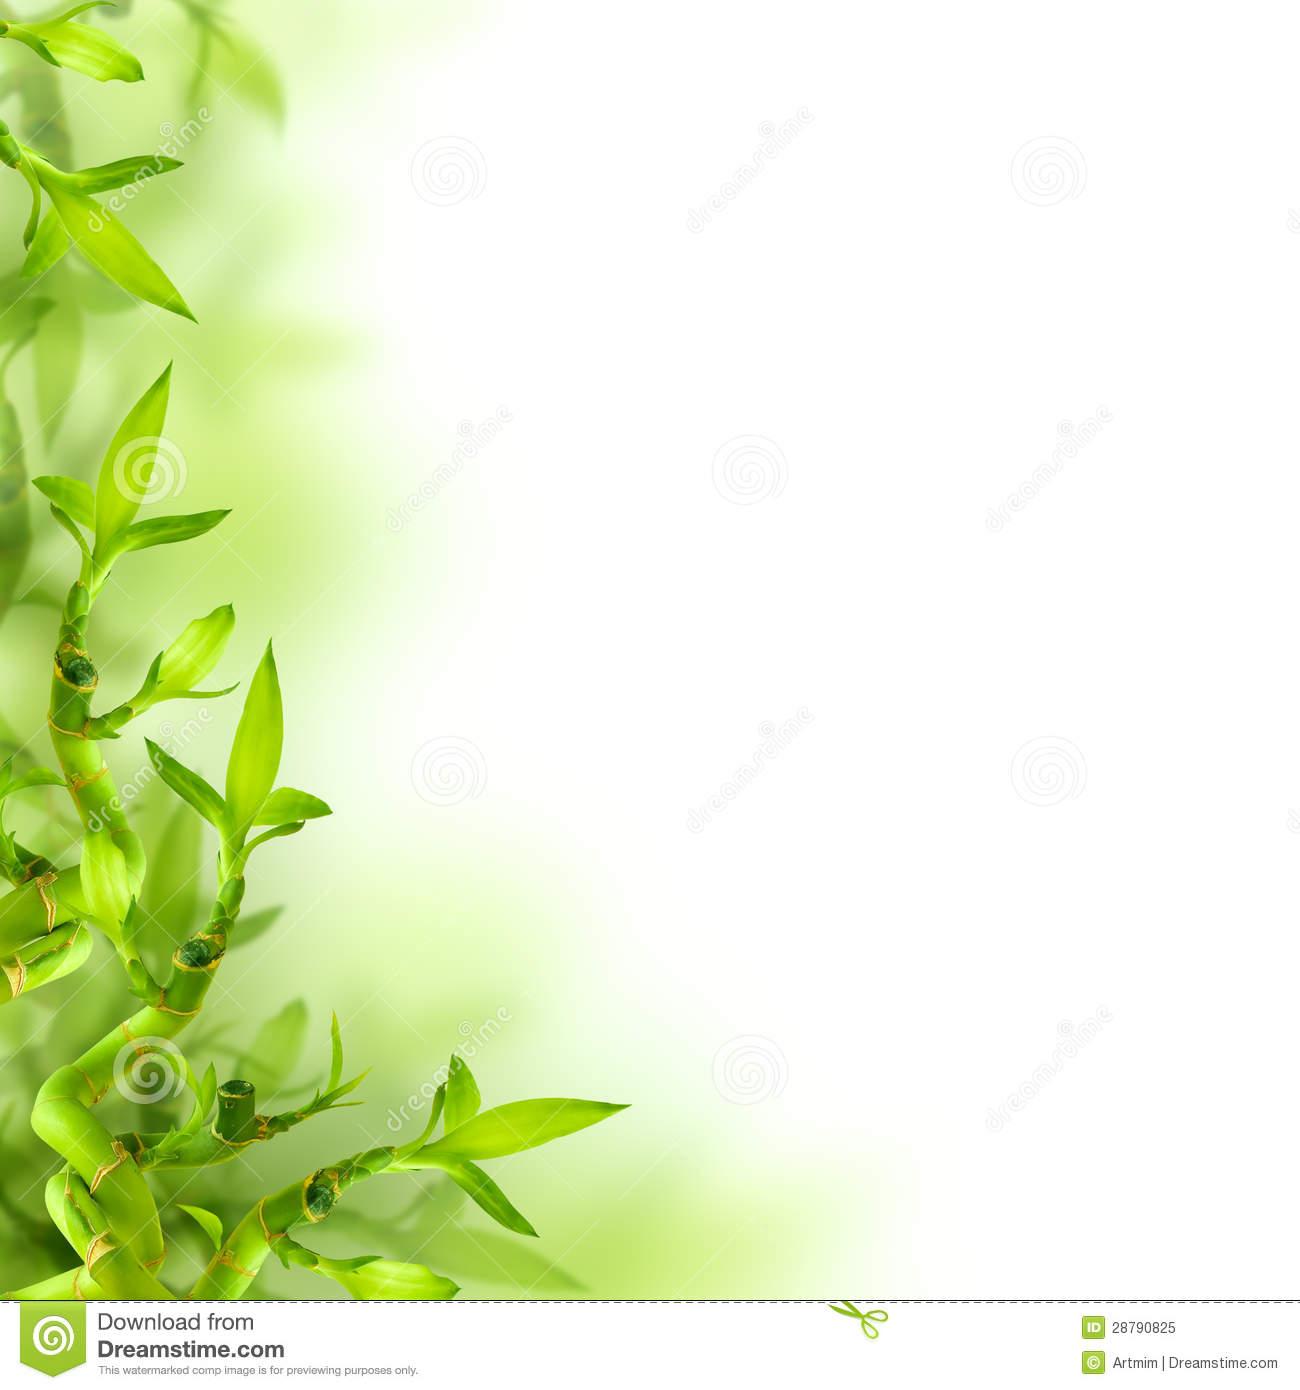 69 Green Leaves Wallpaper On Wallpapersafari